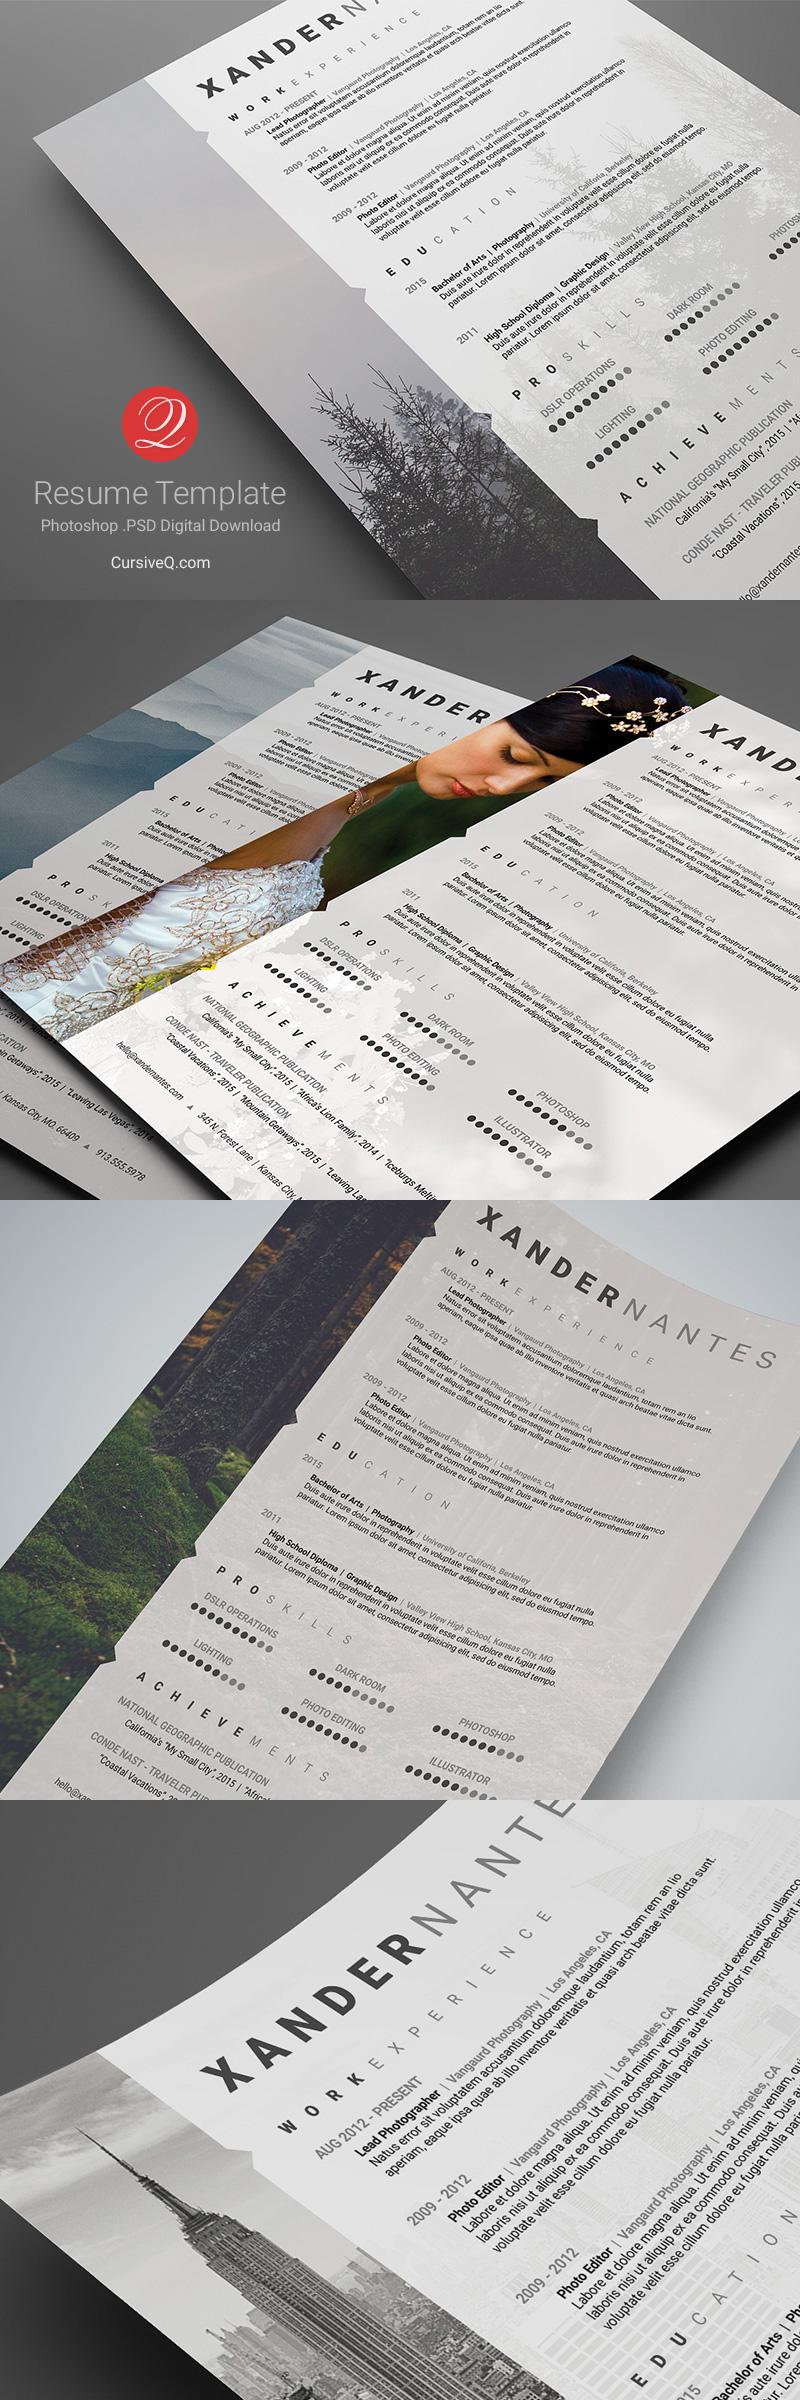 Photographer Resume Photoshop PSD Template